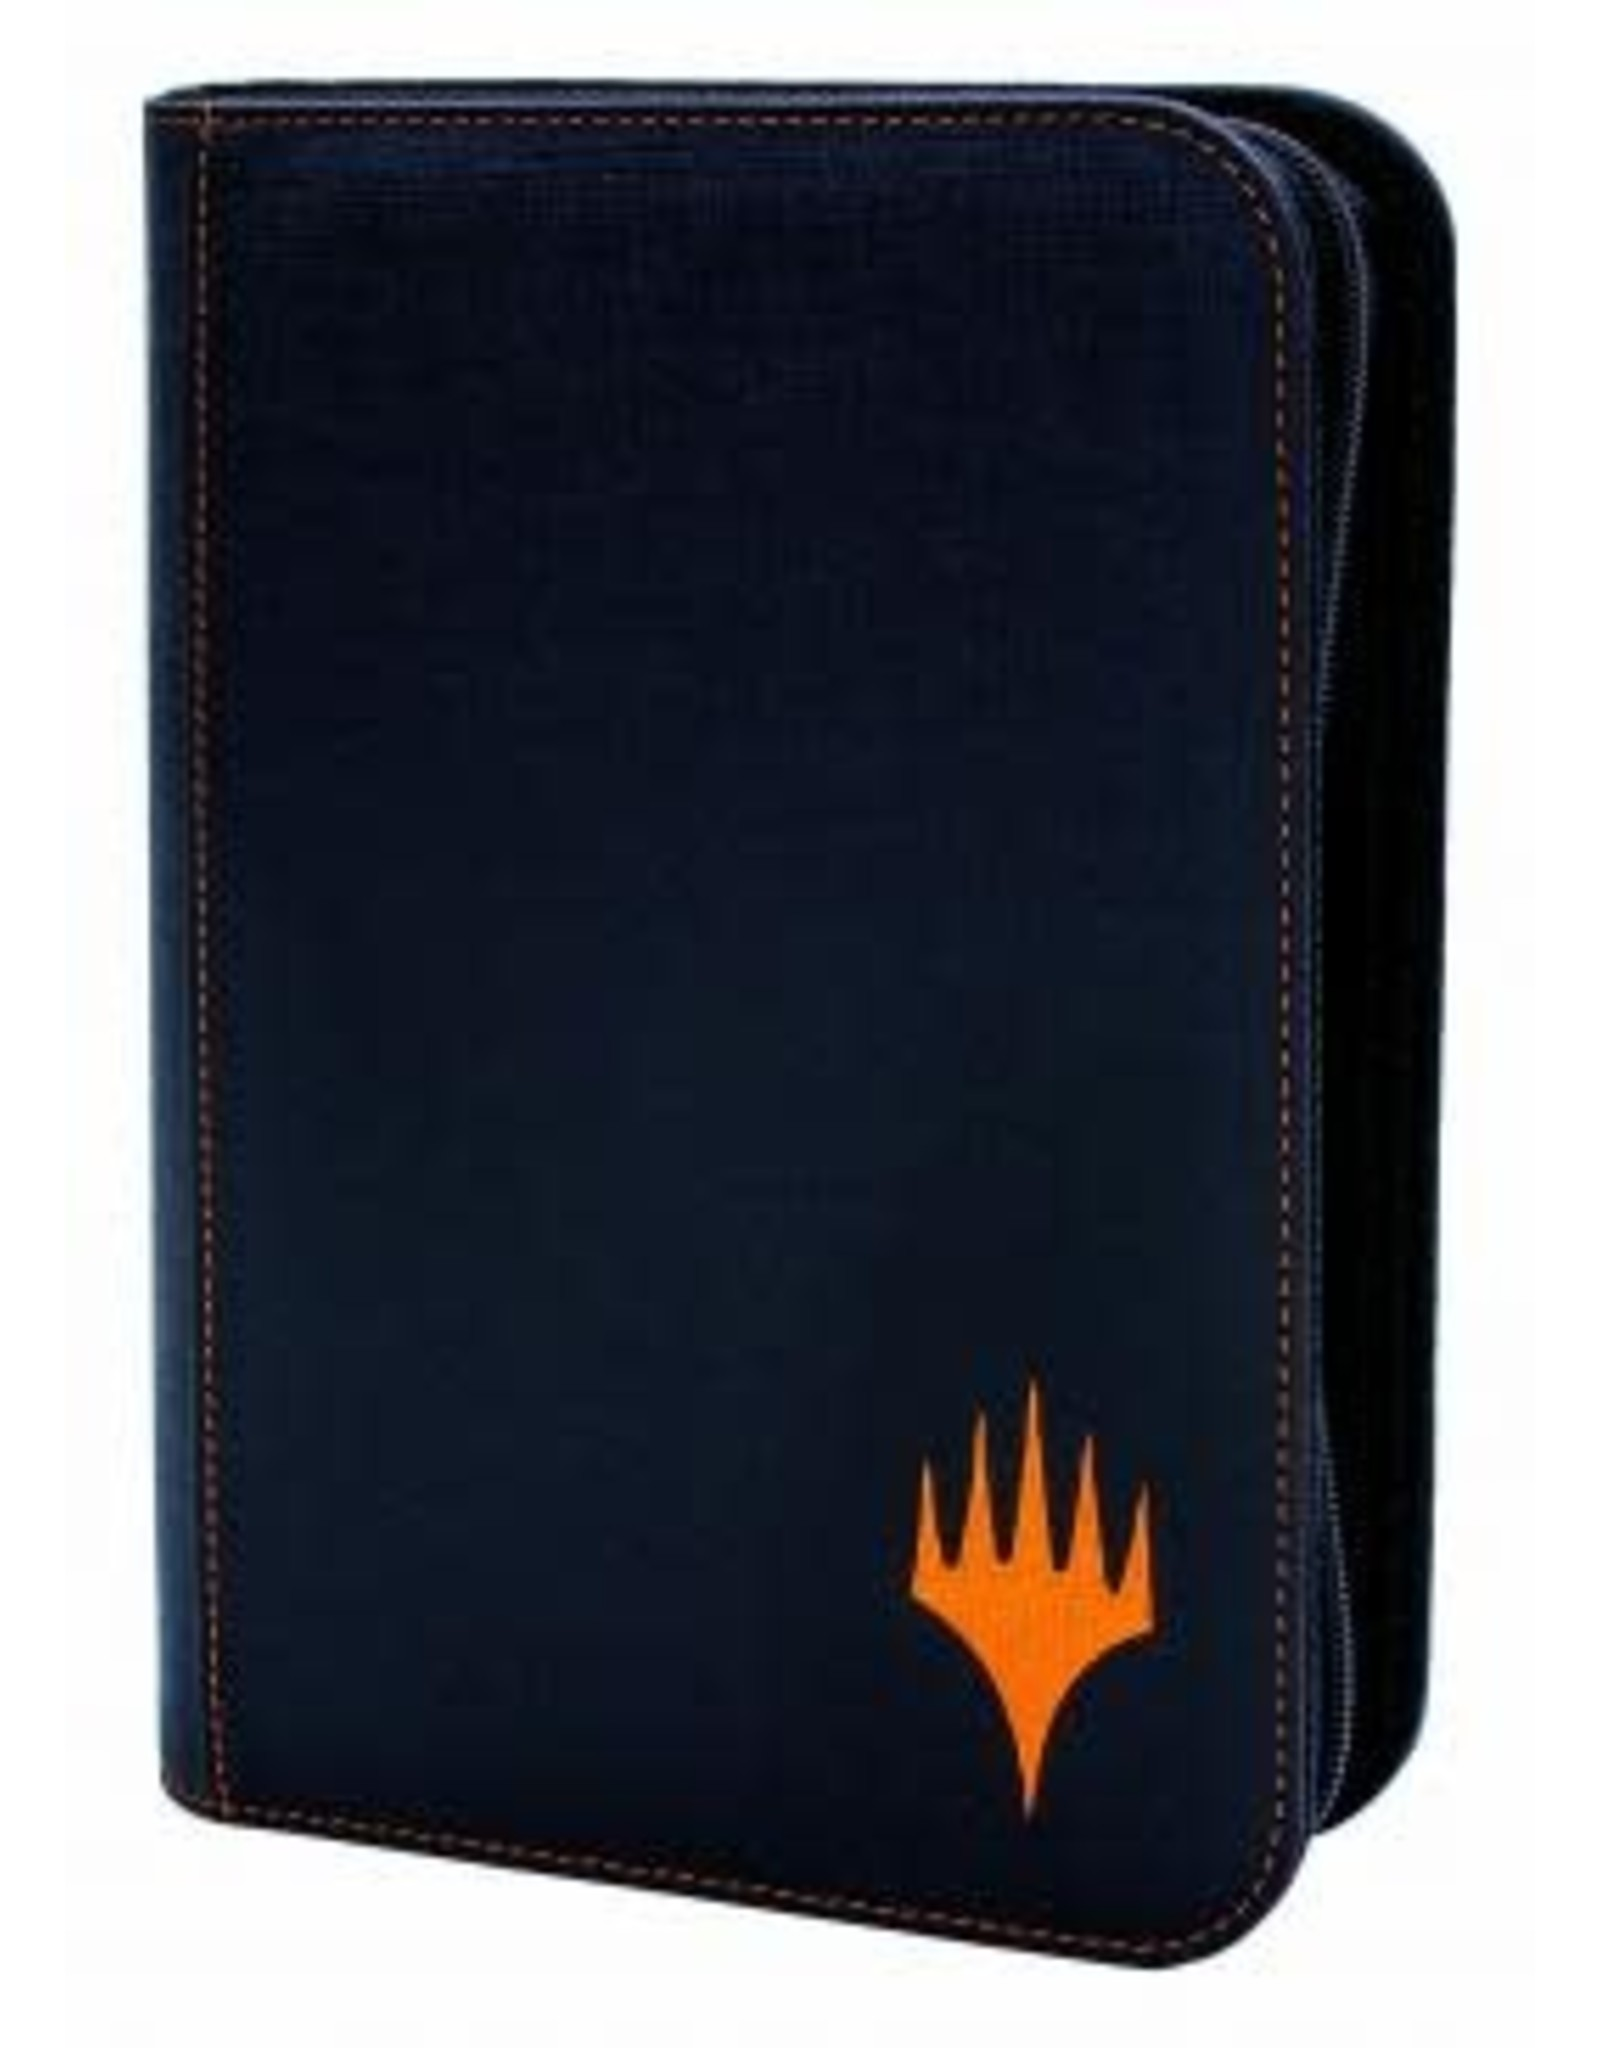 Ultra Pro Ultra Pro Mythic Edition 4 Pocket Zippered Binder